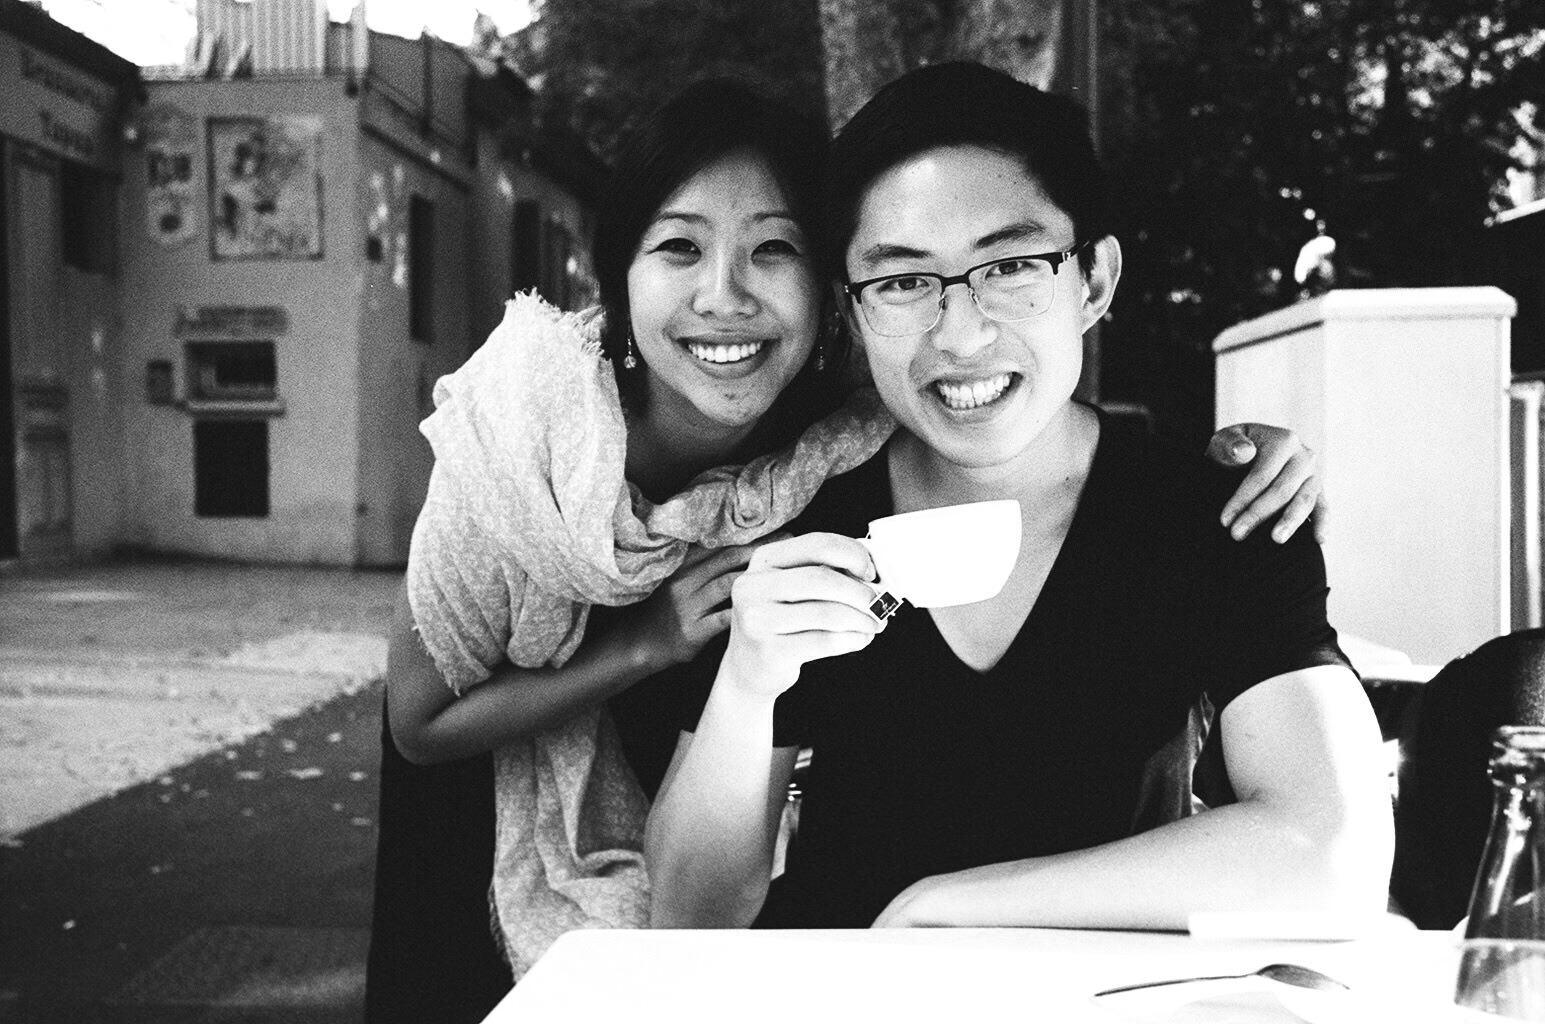 eric kim photography black and white tri x 1600 leica mp 35mm film-1436